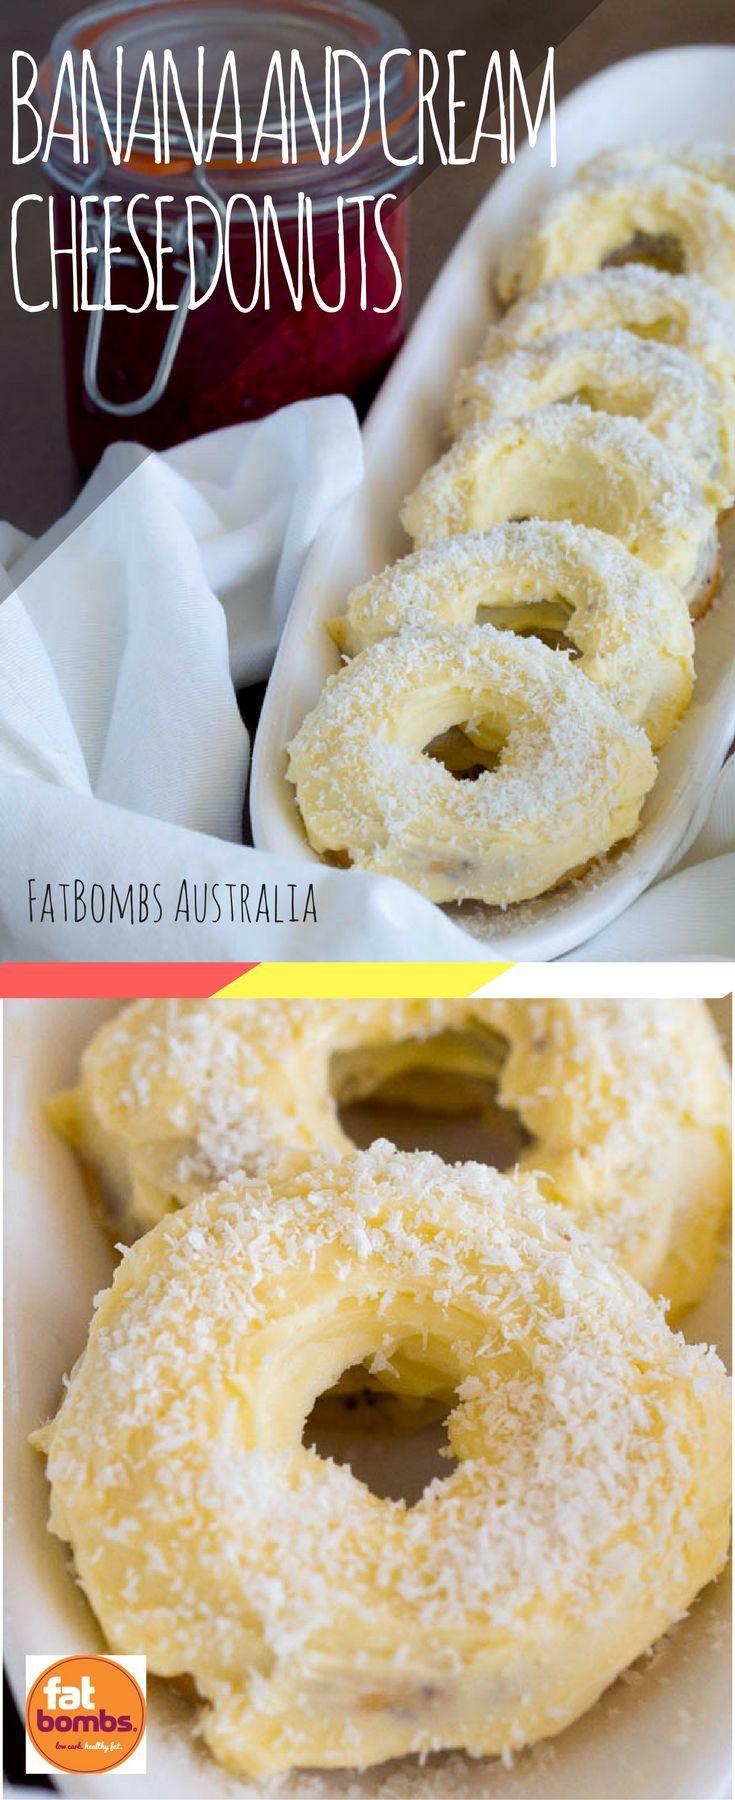 Banana and cream cheese keto donuts recipe low carb